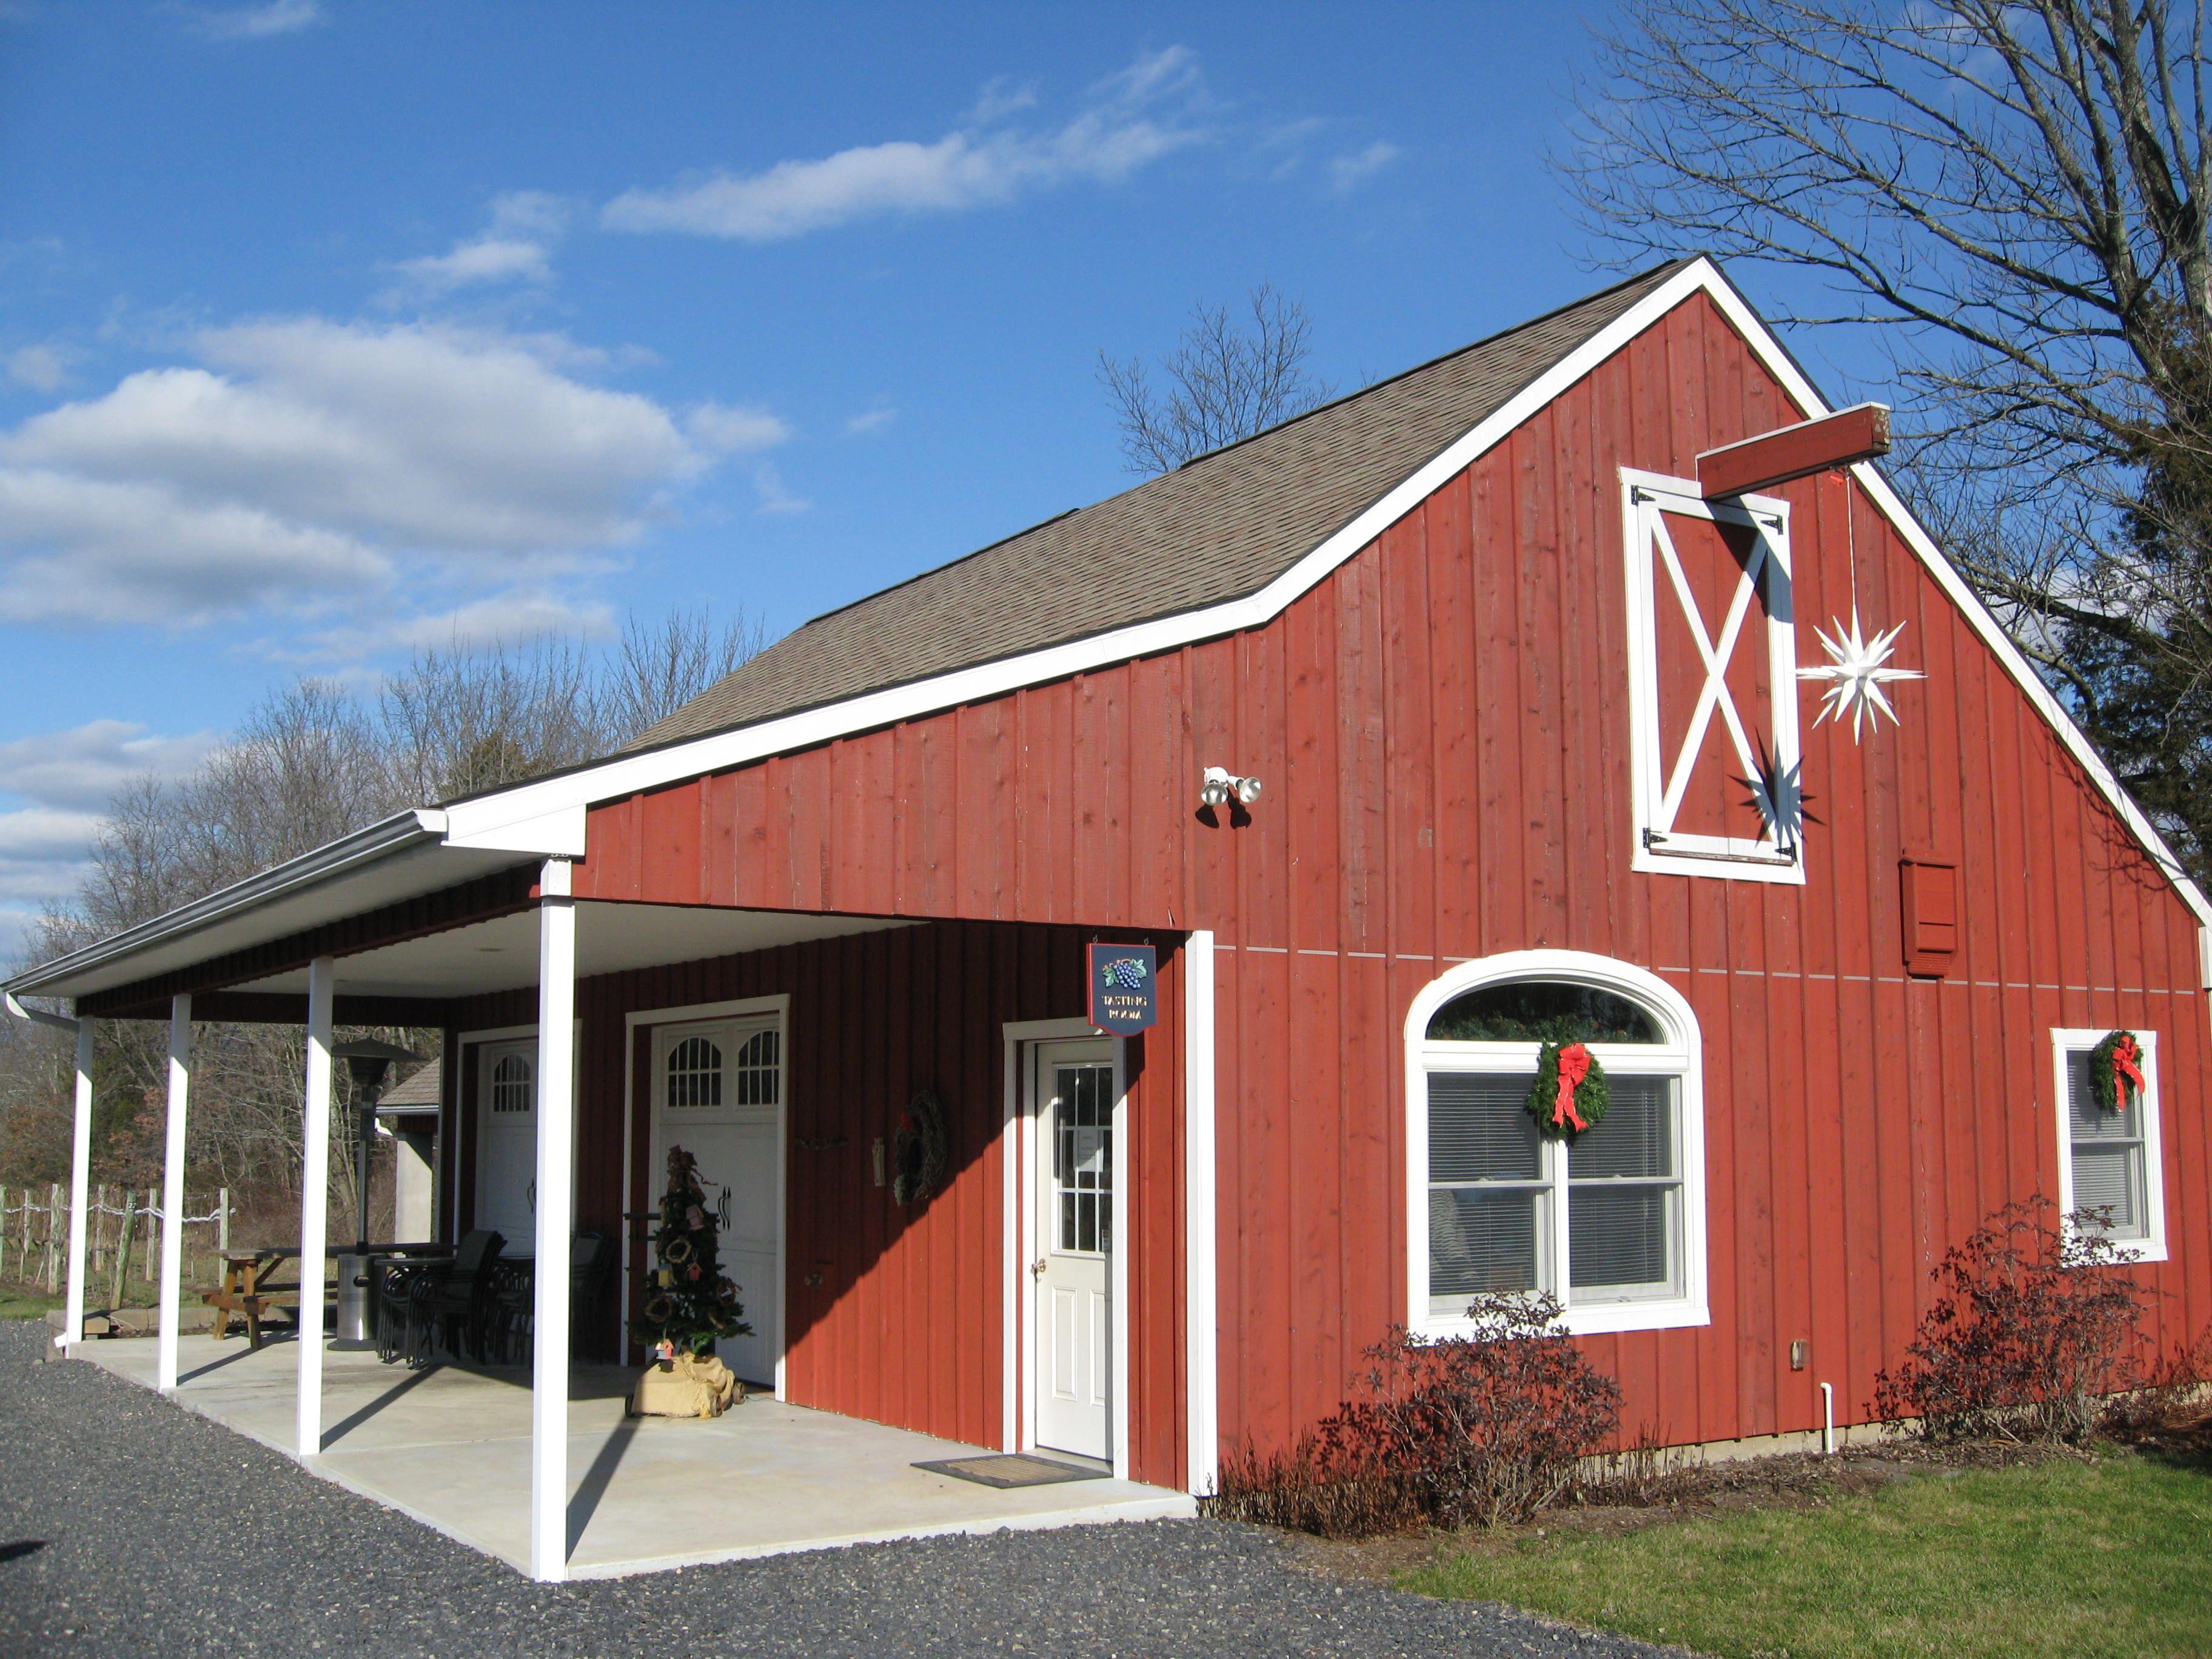 The Tasting Room At Unami Ridge Winery Bucks County Pa Bucks County Pa Ridge Winery Tasting Room